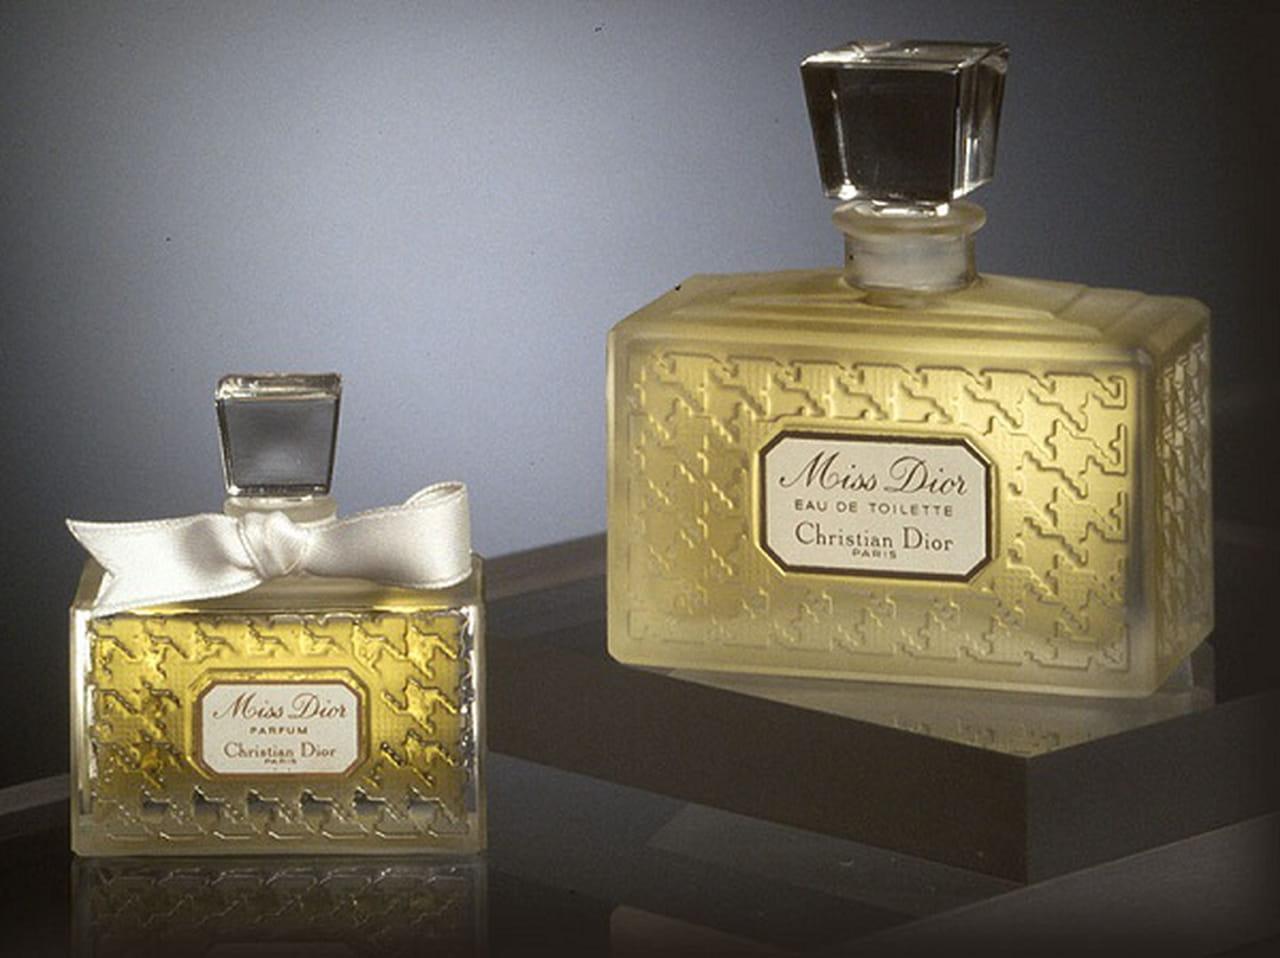 7bac6ce00 عطر Miss Dior شذى الحب في زجاجة